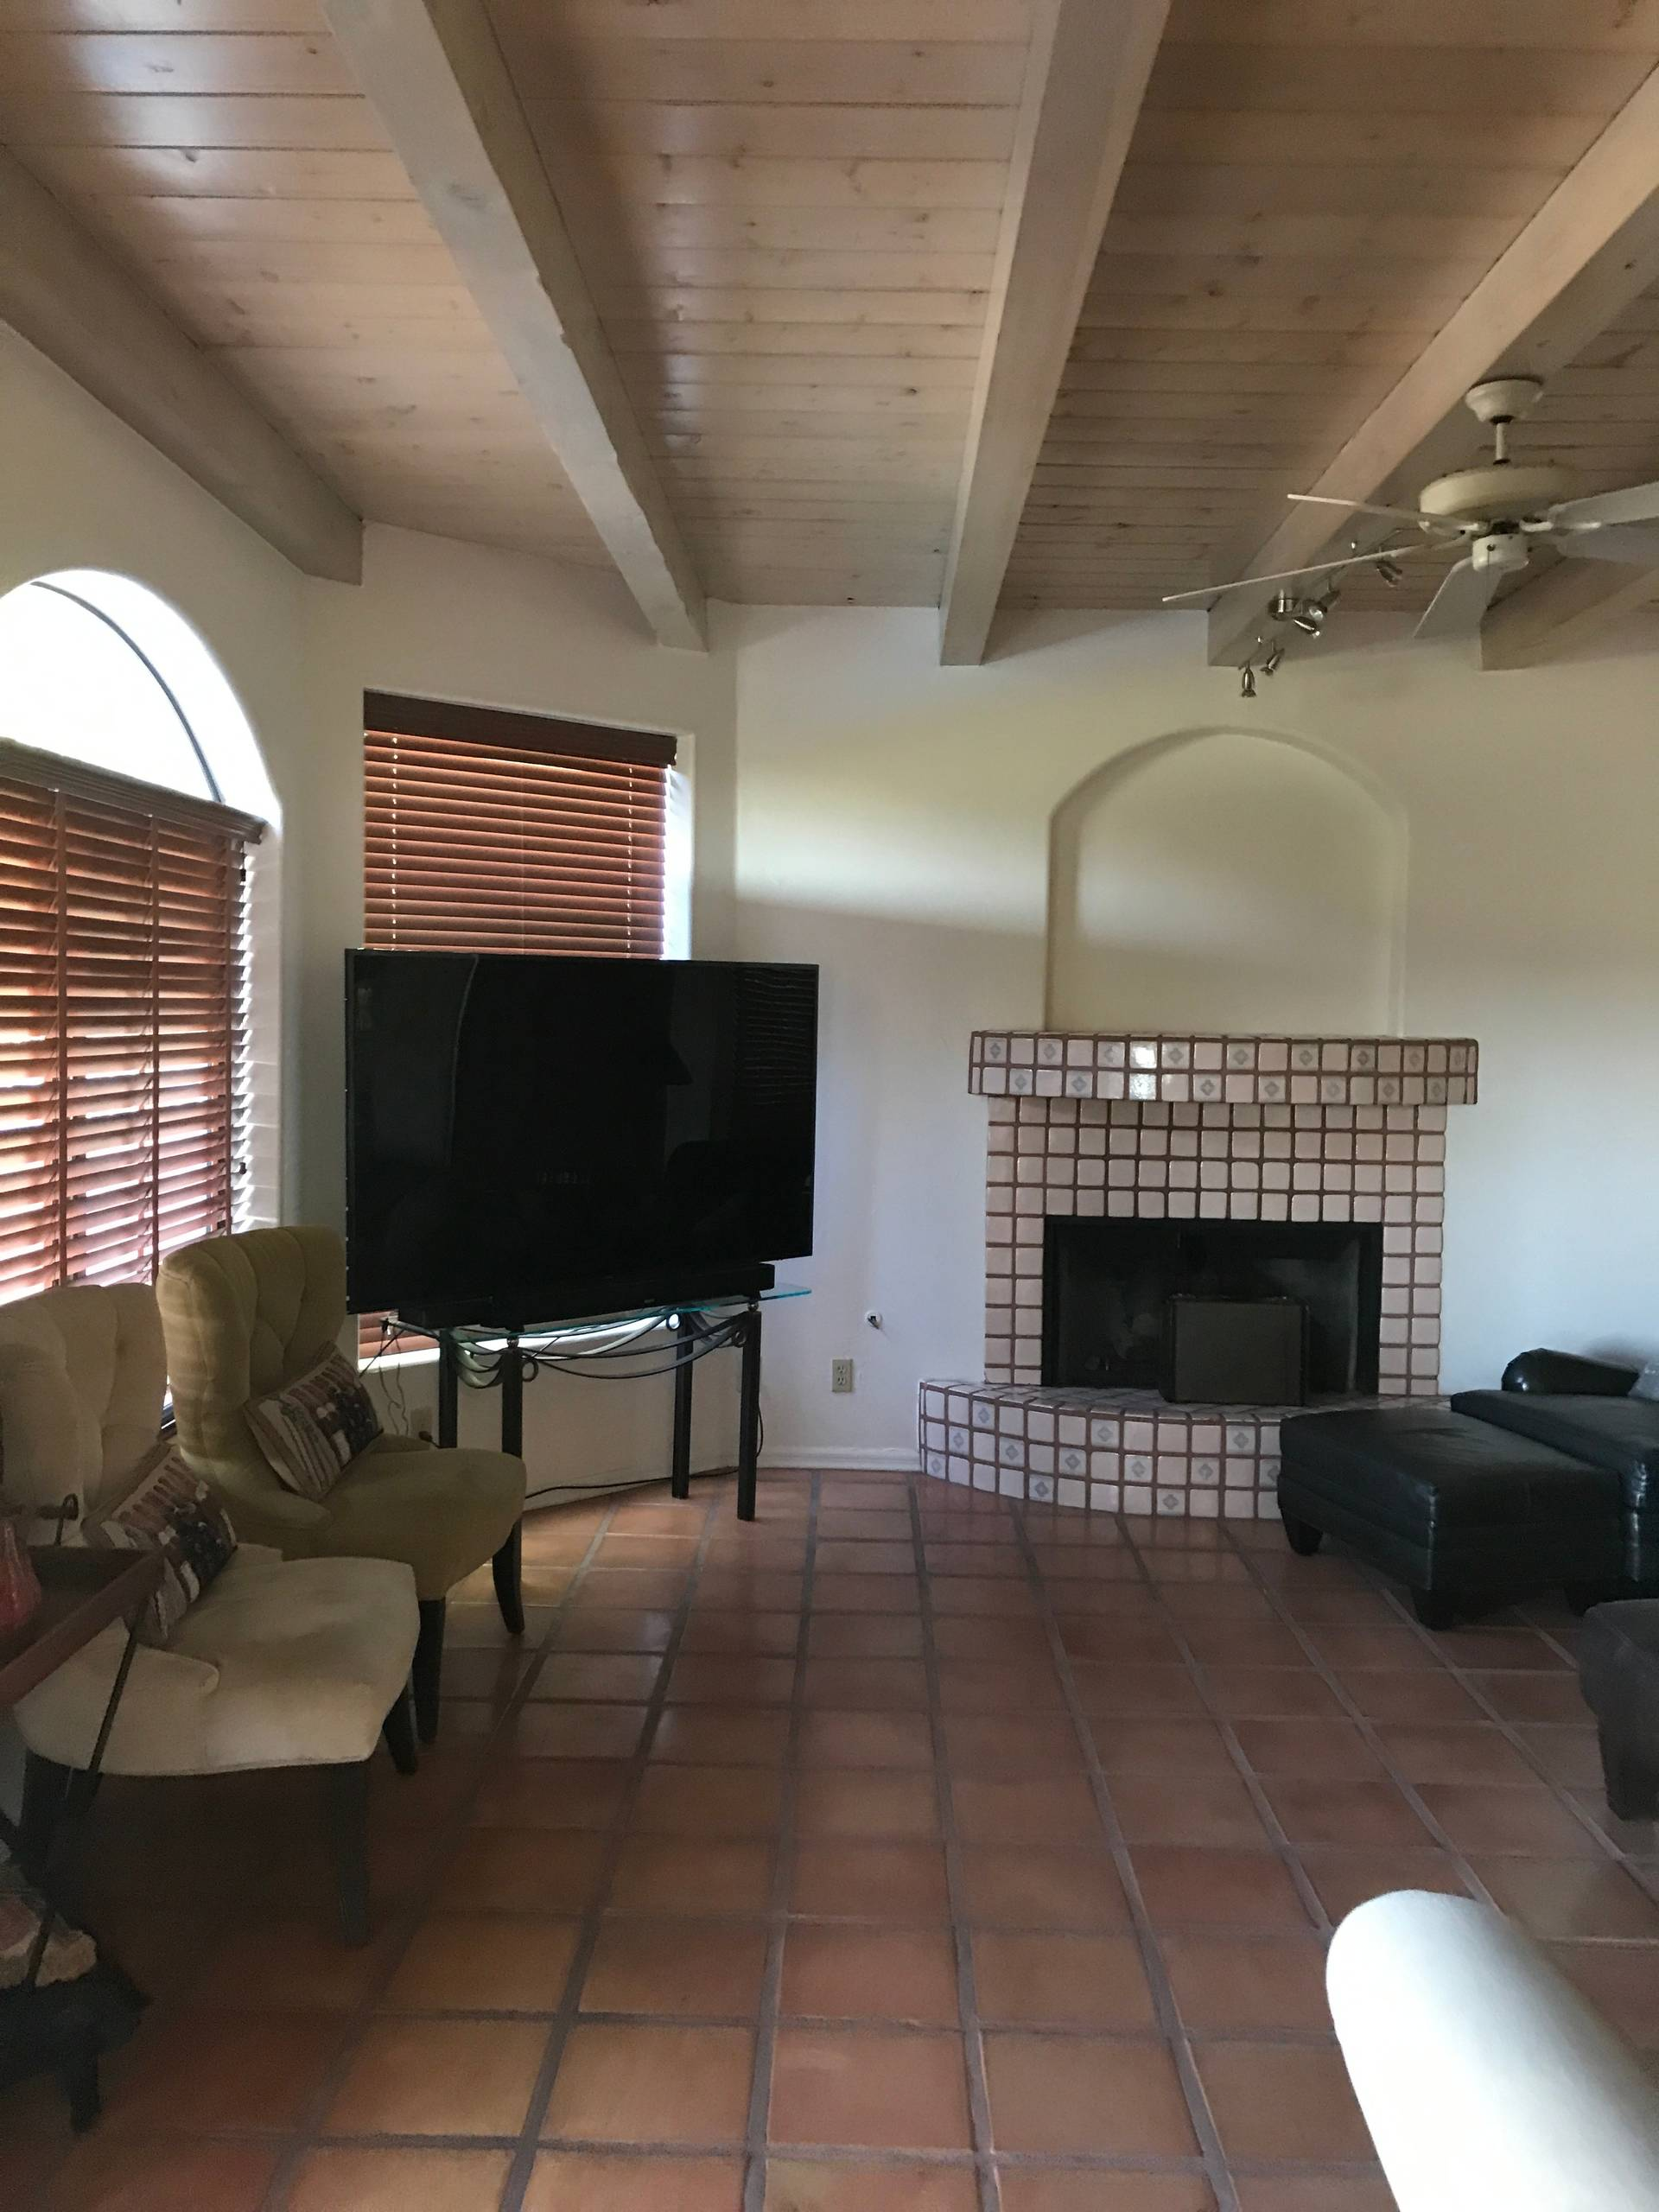 Foothills Kitchen/Living Room/Overall Flooring Remodel